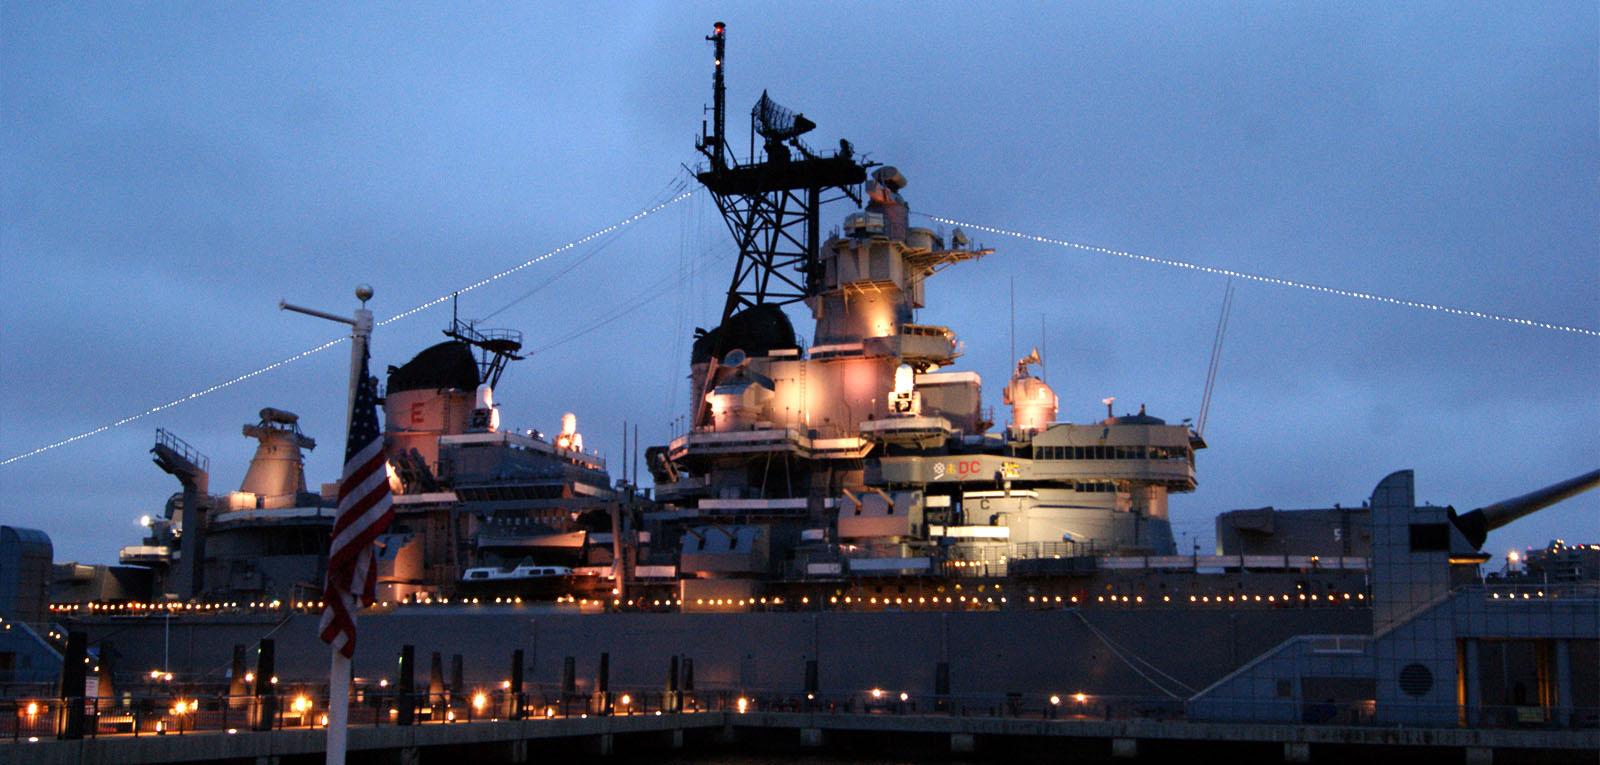 Battleship New Jersey at dusk